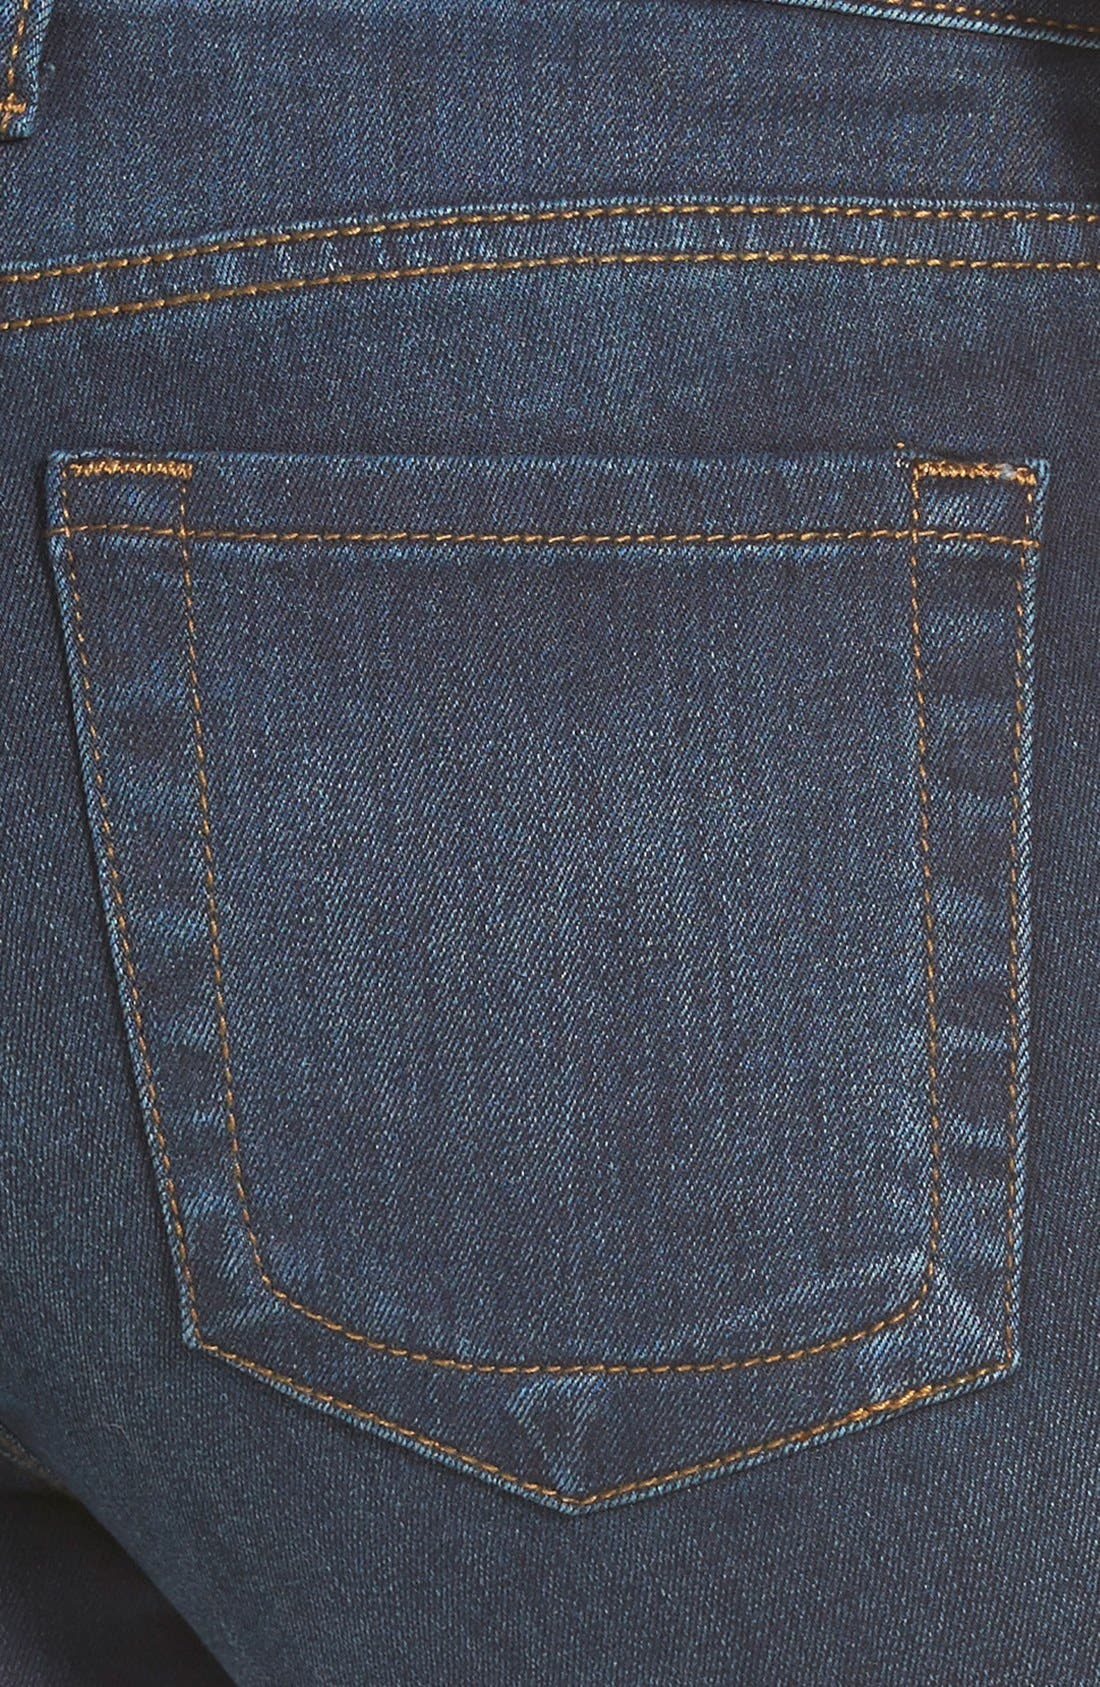 'Diana' Stretch Skinny Jeans,                             Alternate thumbnail 3, color,                             Breezy